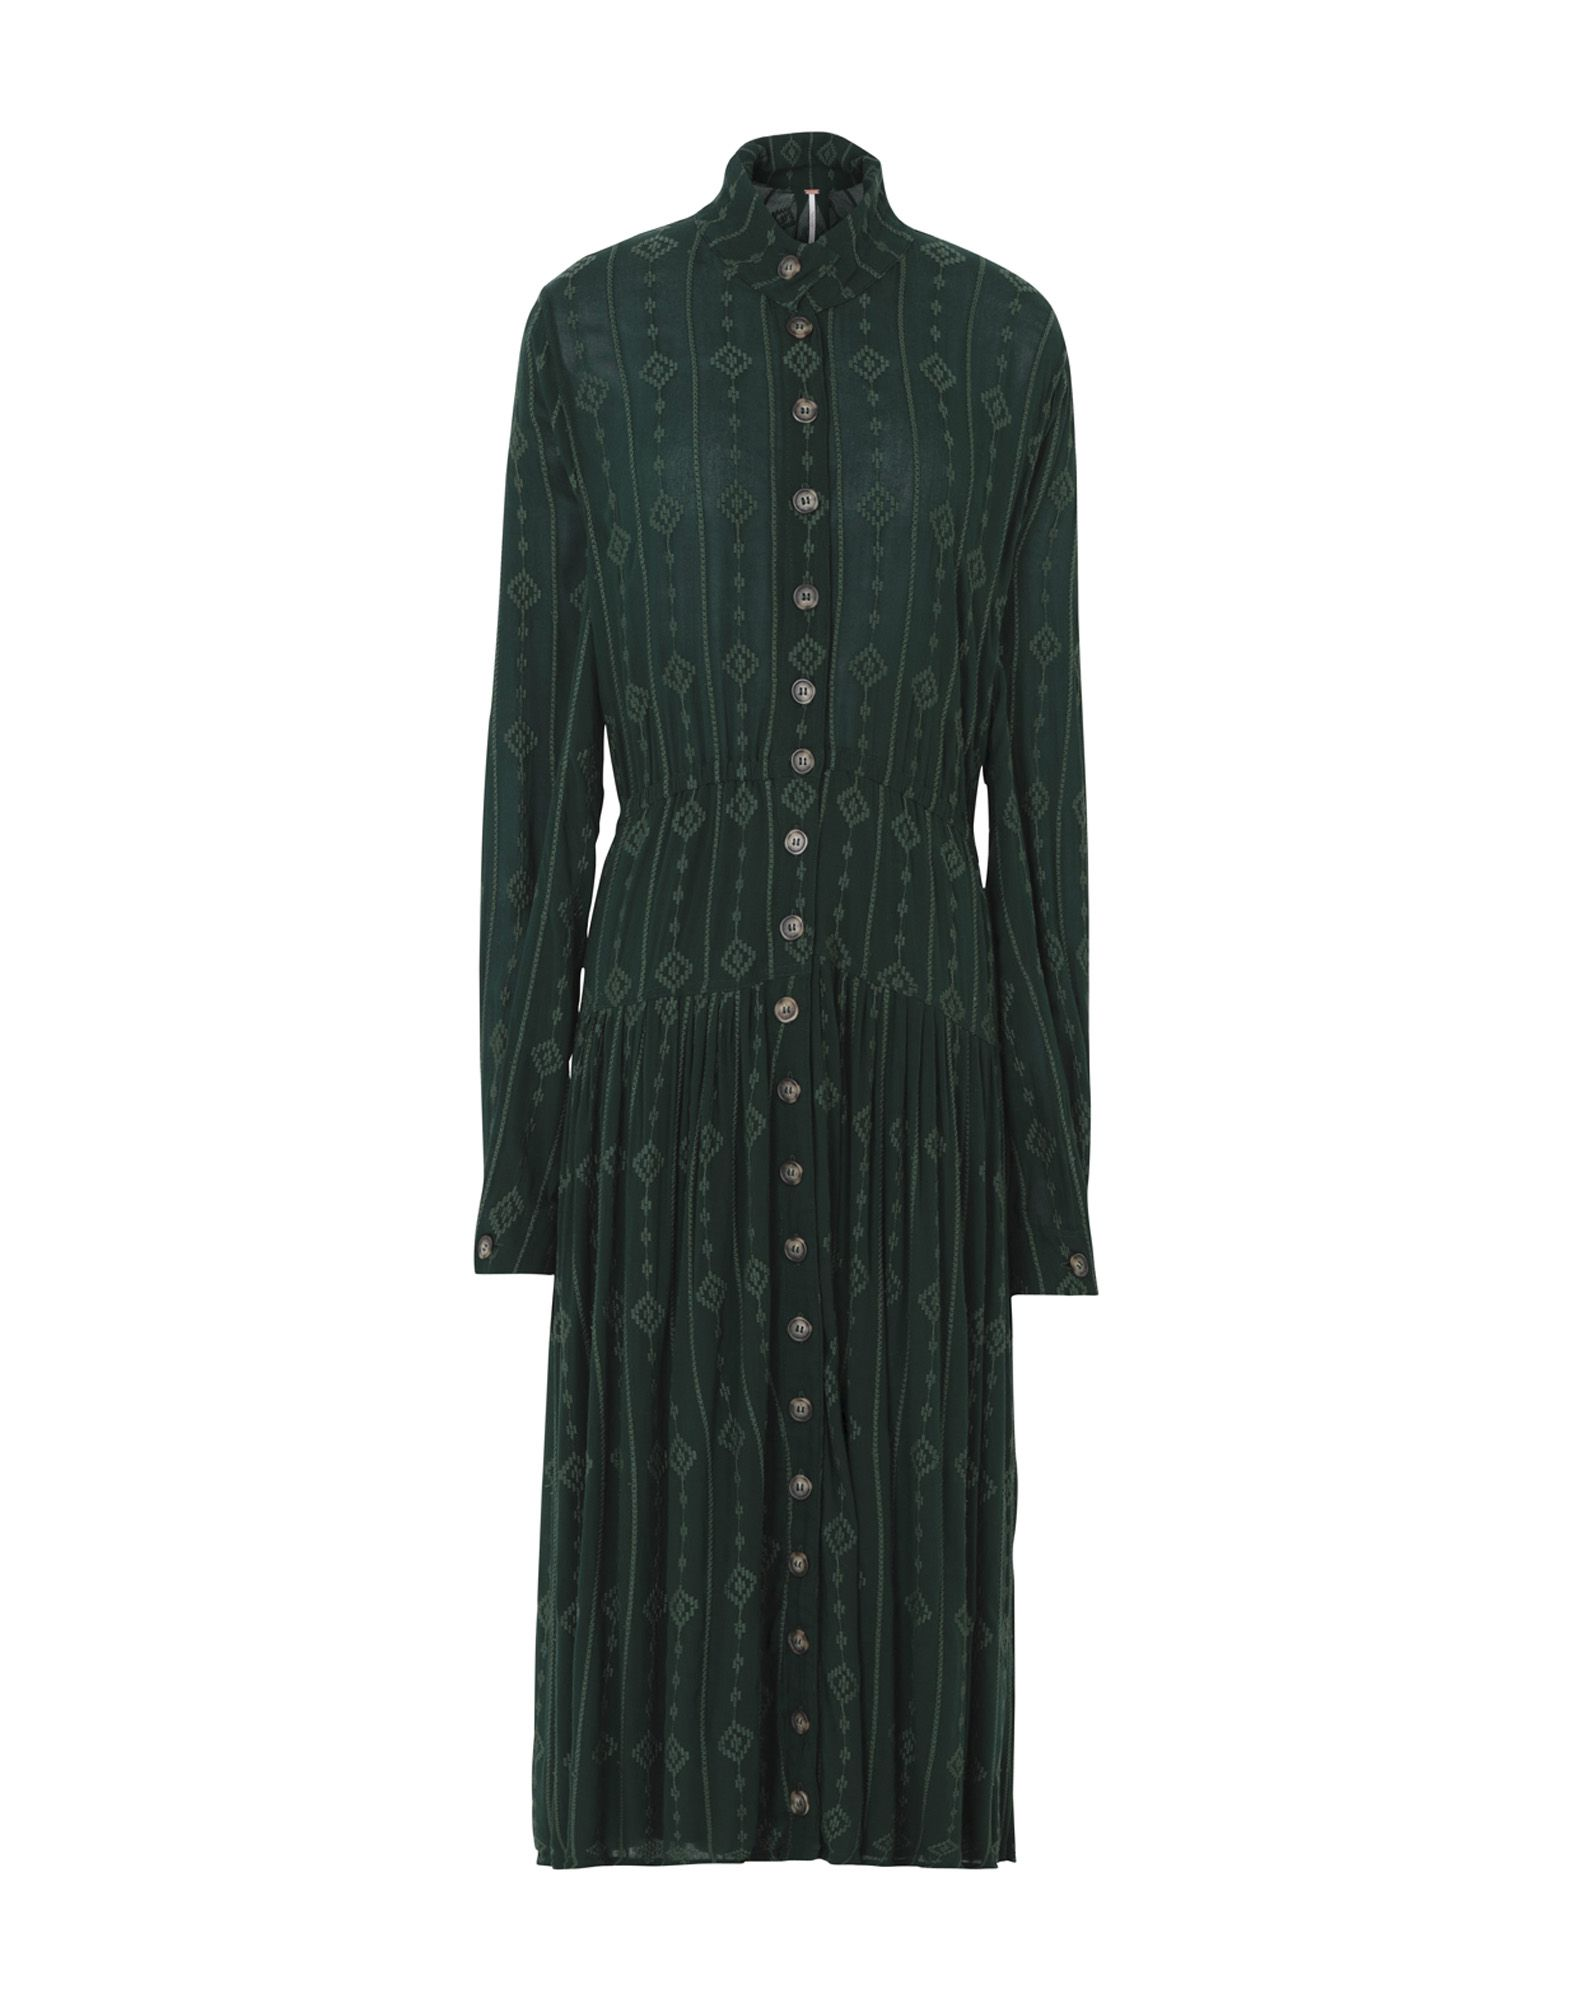 FREE PEOPLE Платье длиной 3/4 платье джинсовое free people free people fr045ewcbiq8